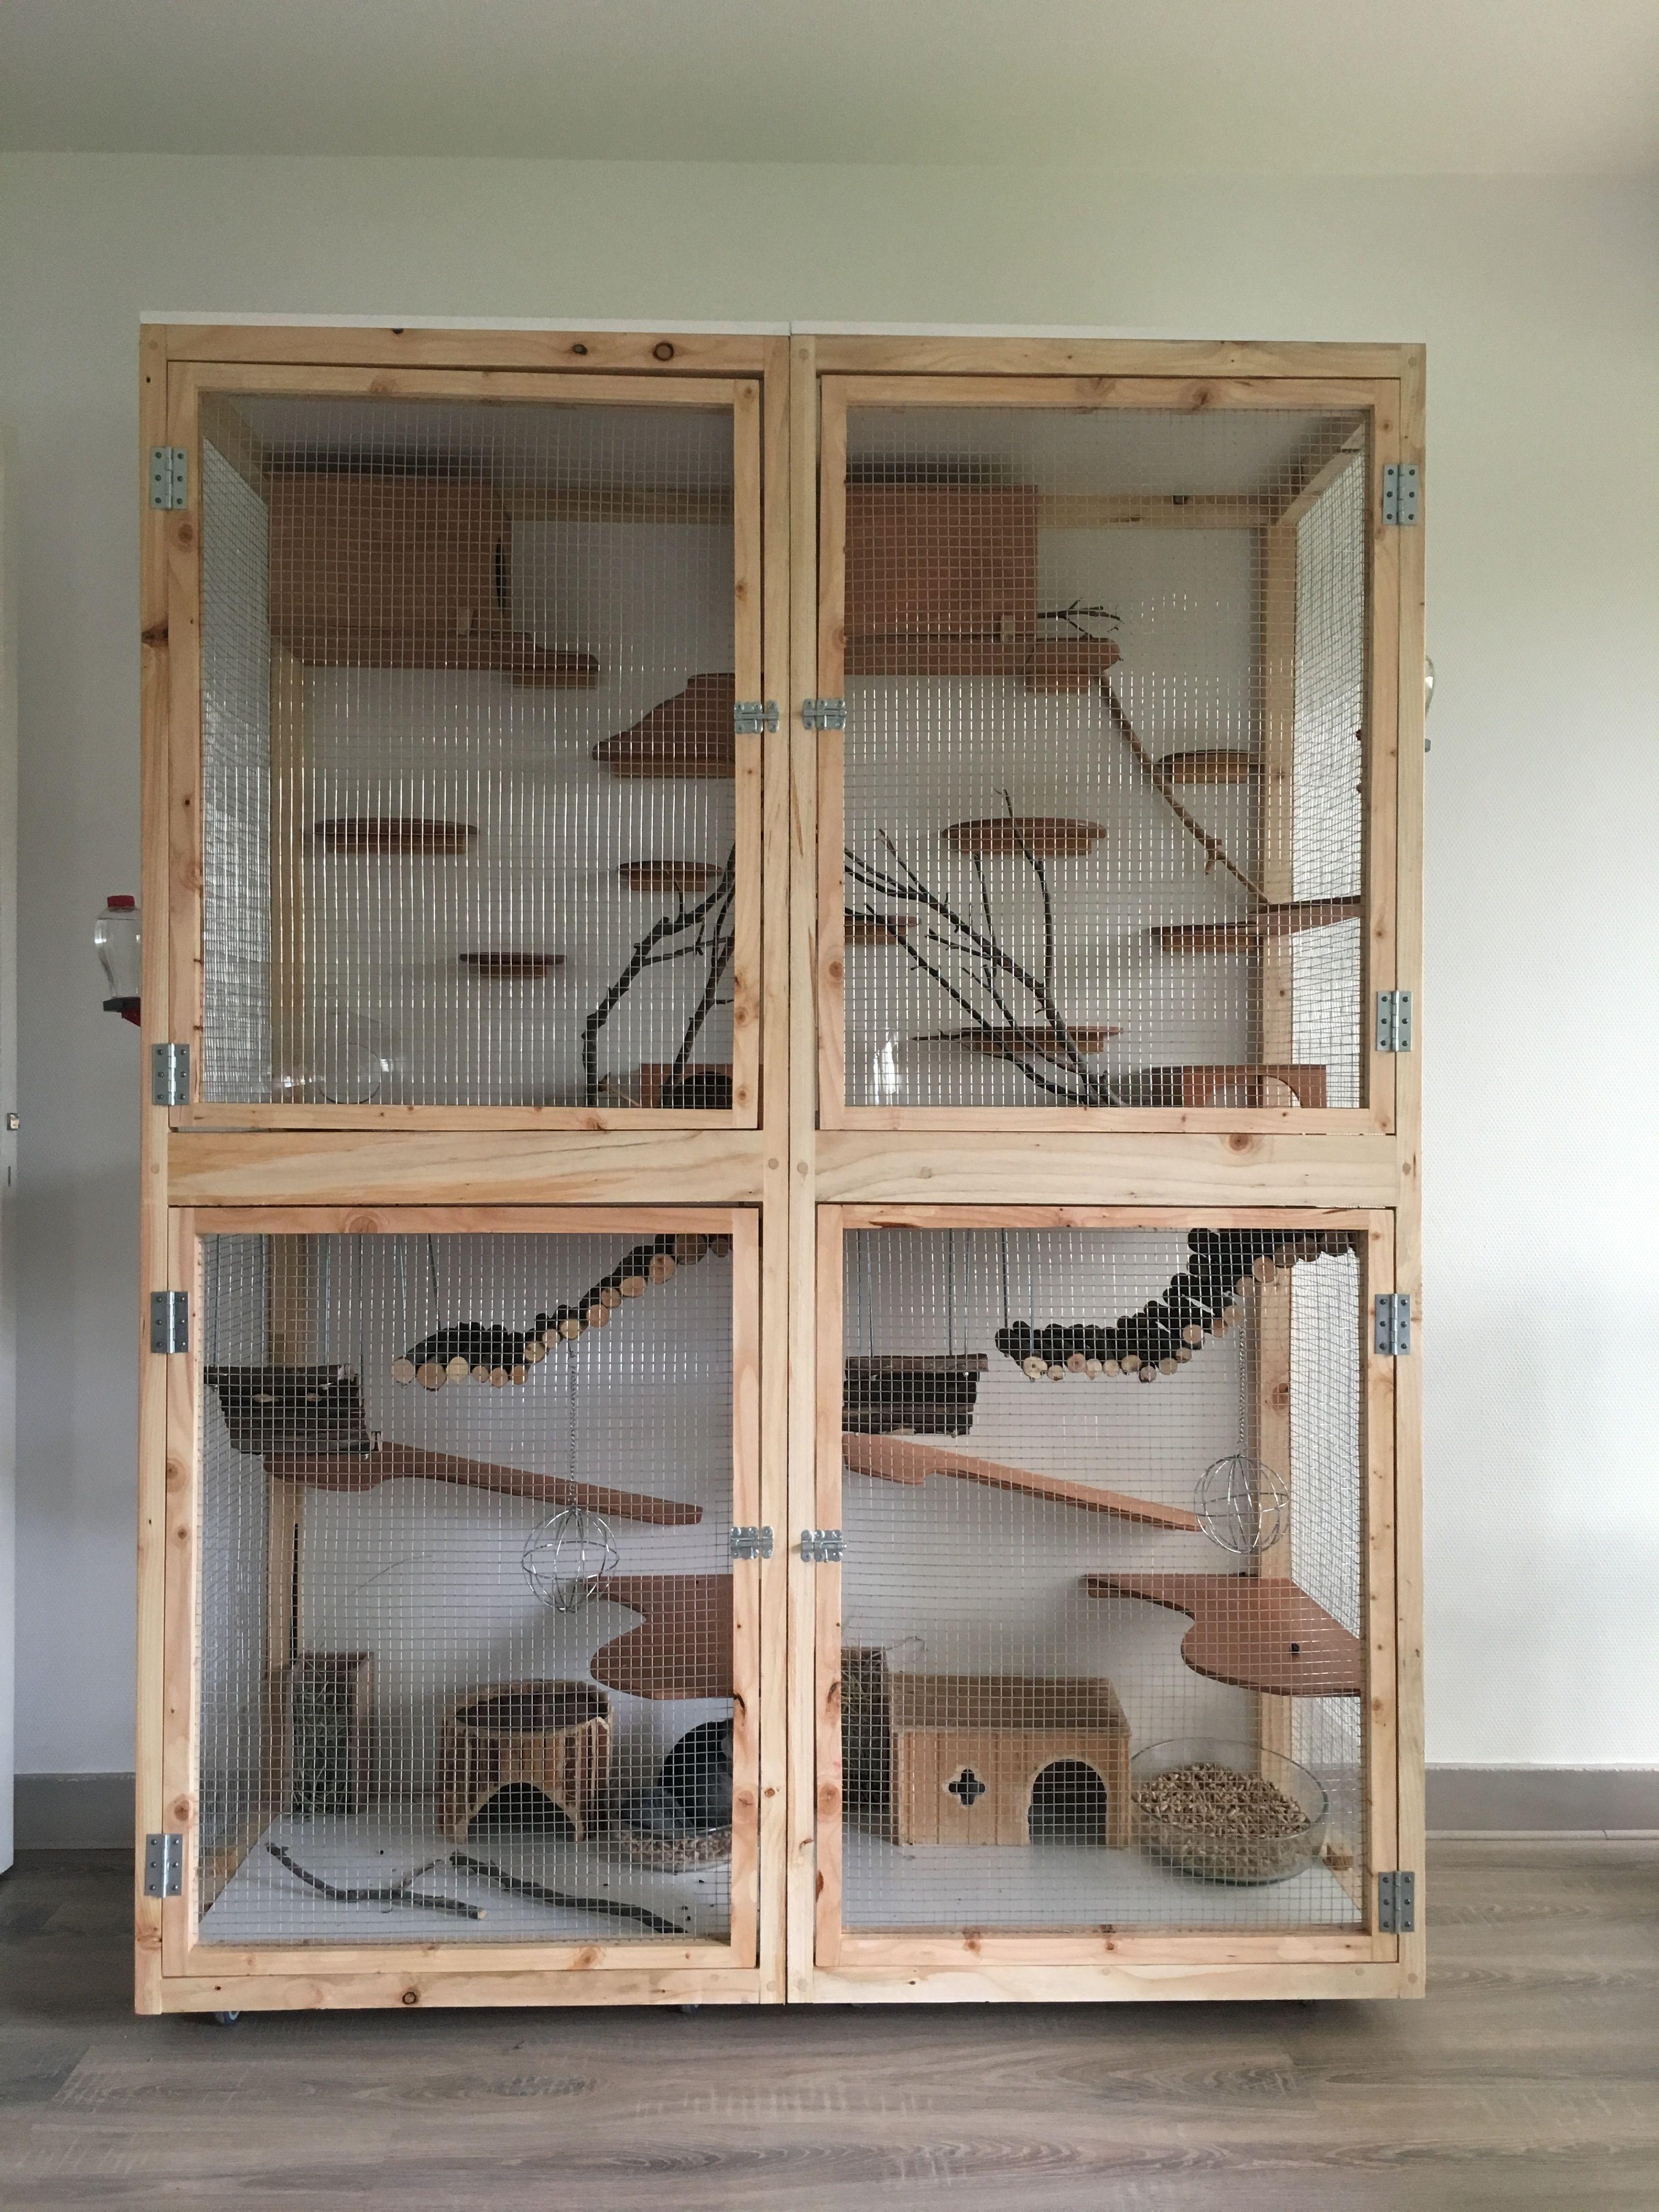 Flying squirrel cage. Chinchilla käfig